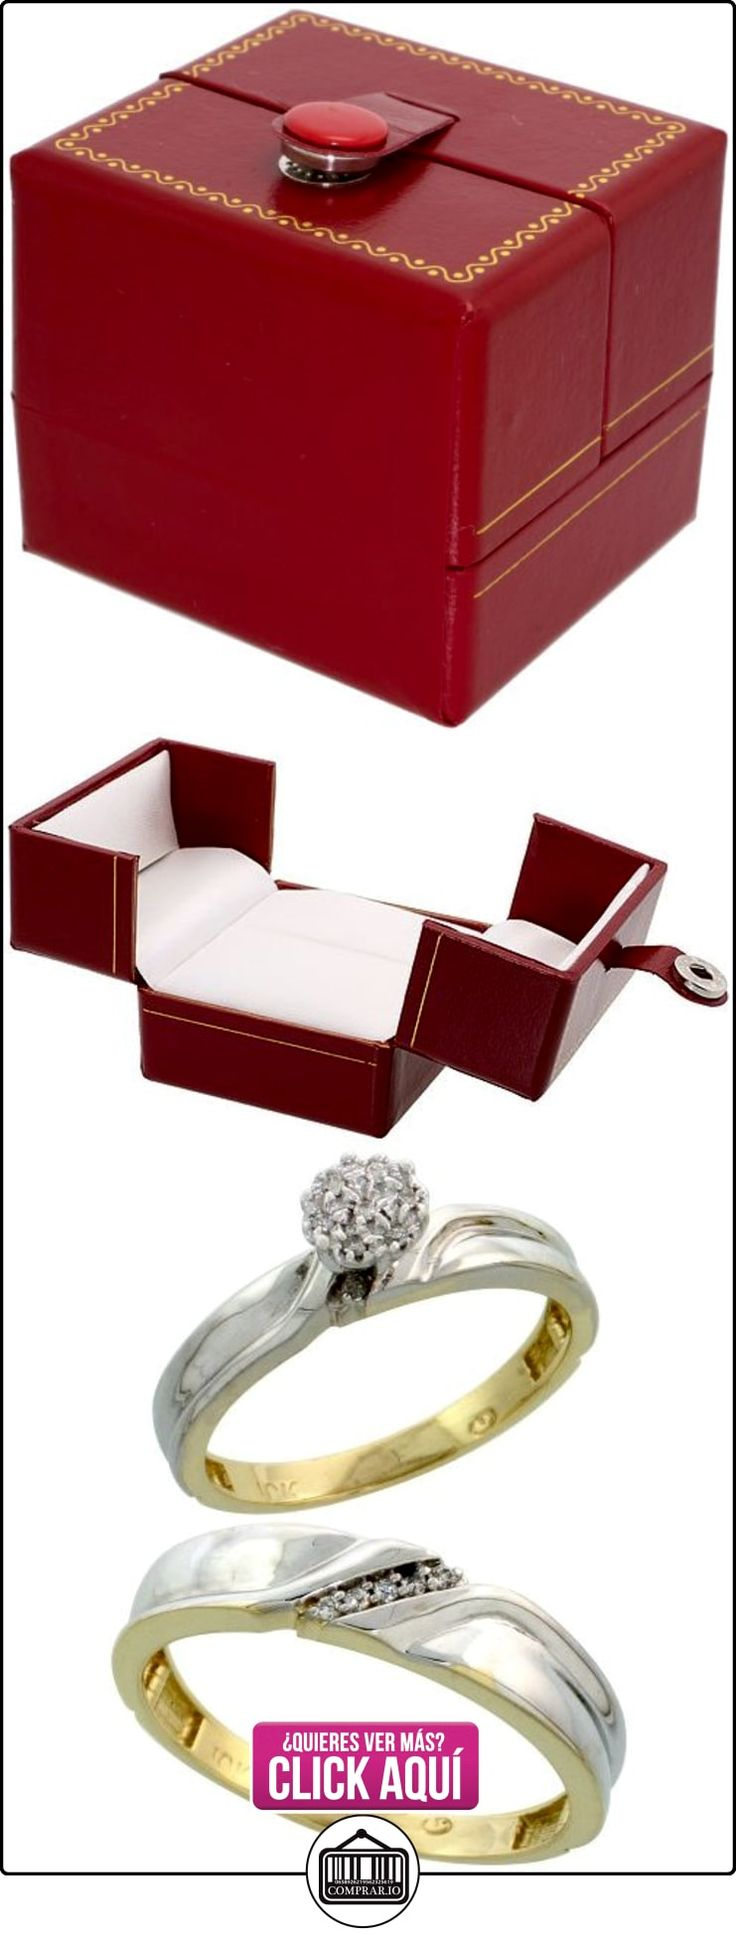 Revoni - Anillo de compromiso de oro amarillo  ✿ Joyas para hombres especiales - lujo ✿ ▬► Ver oferta: http://comprar.io/goto/B005M3CN14